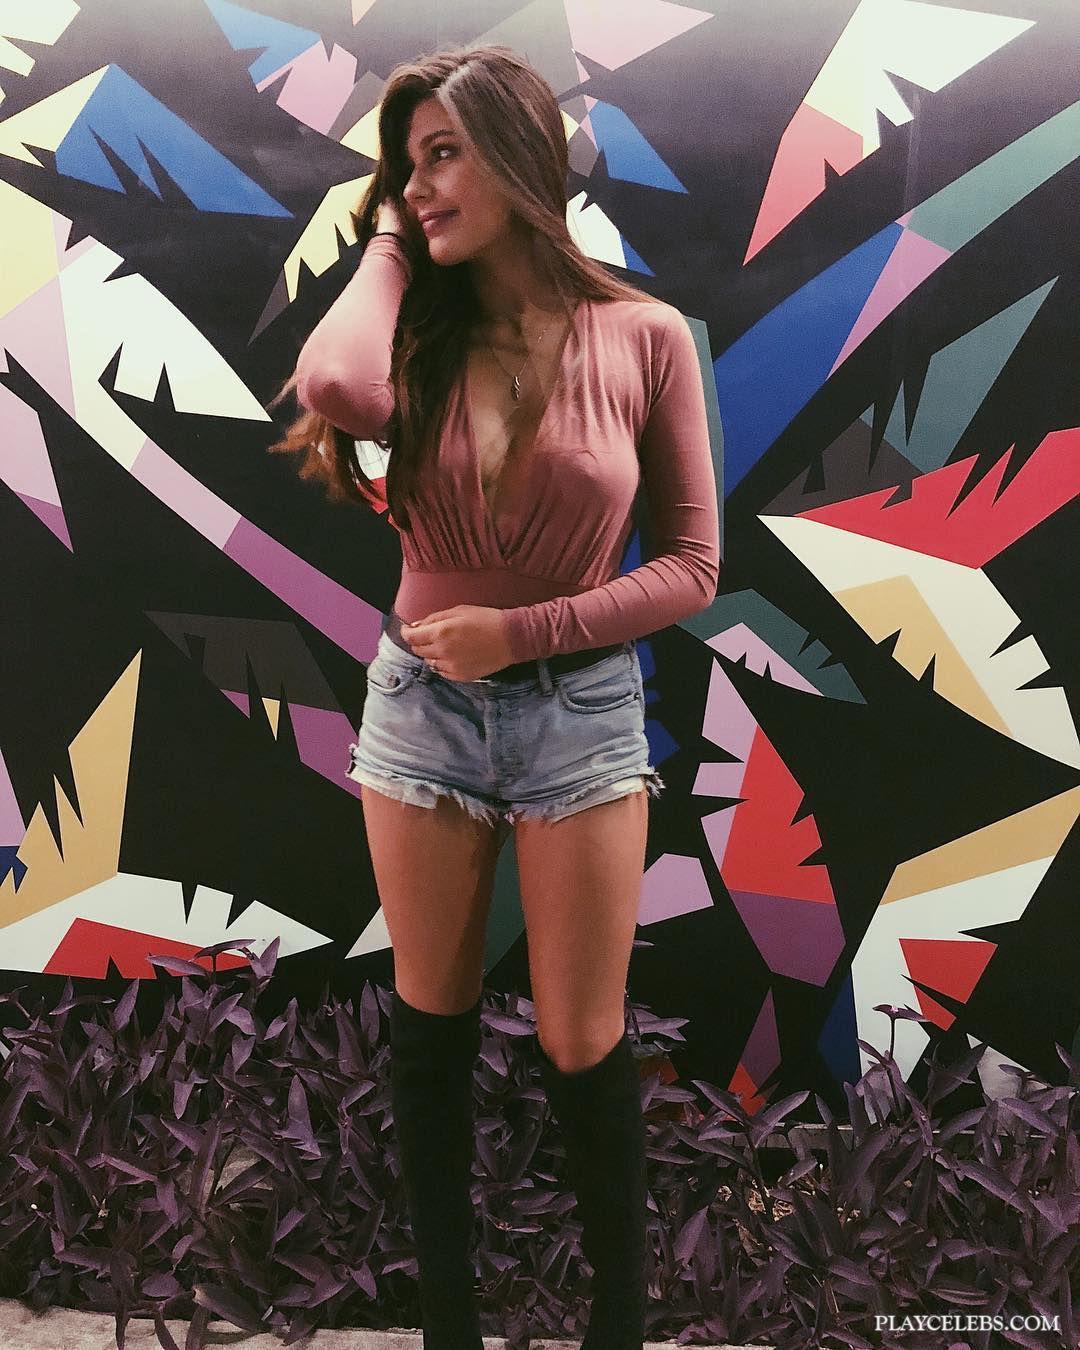 Amber Montana Various Erotic Selfie From Instagram